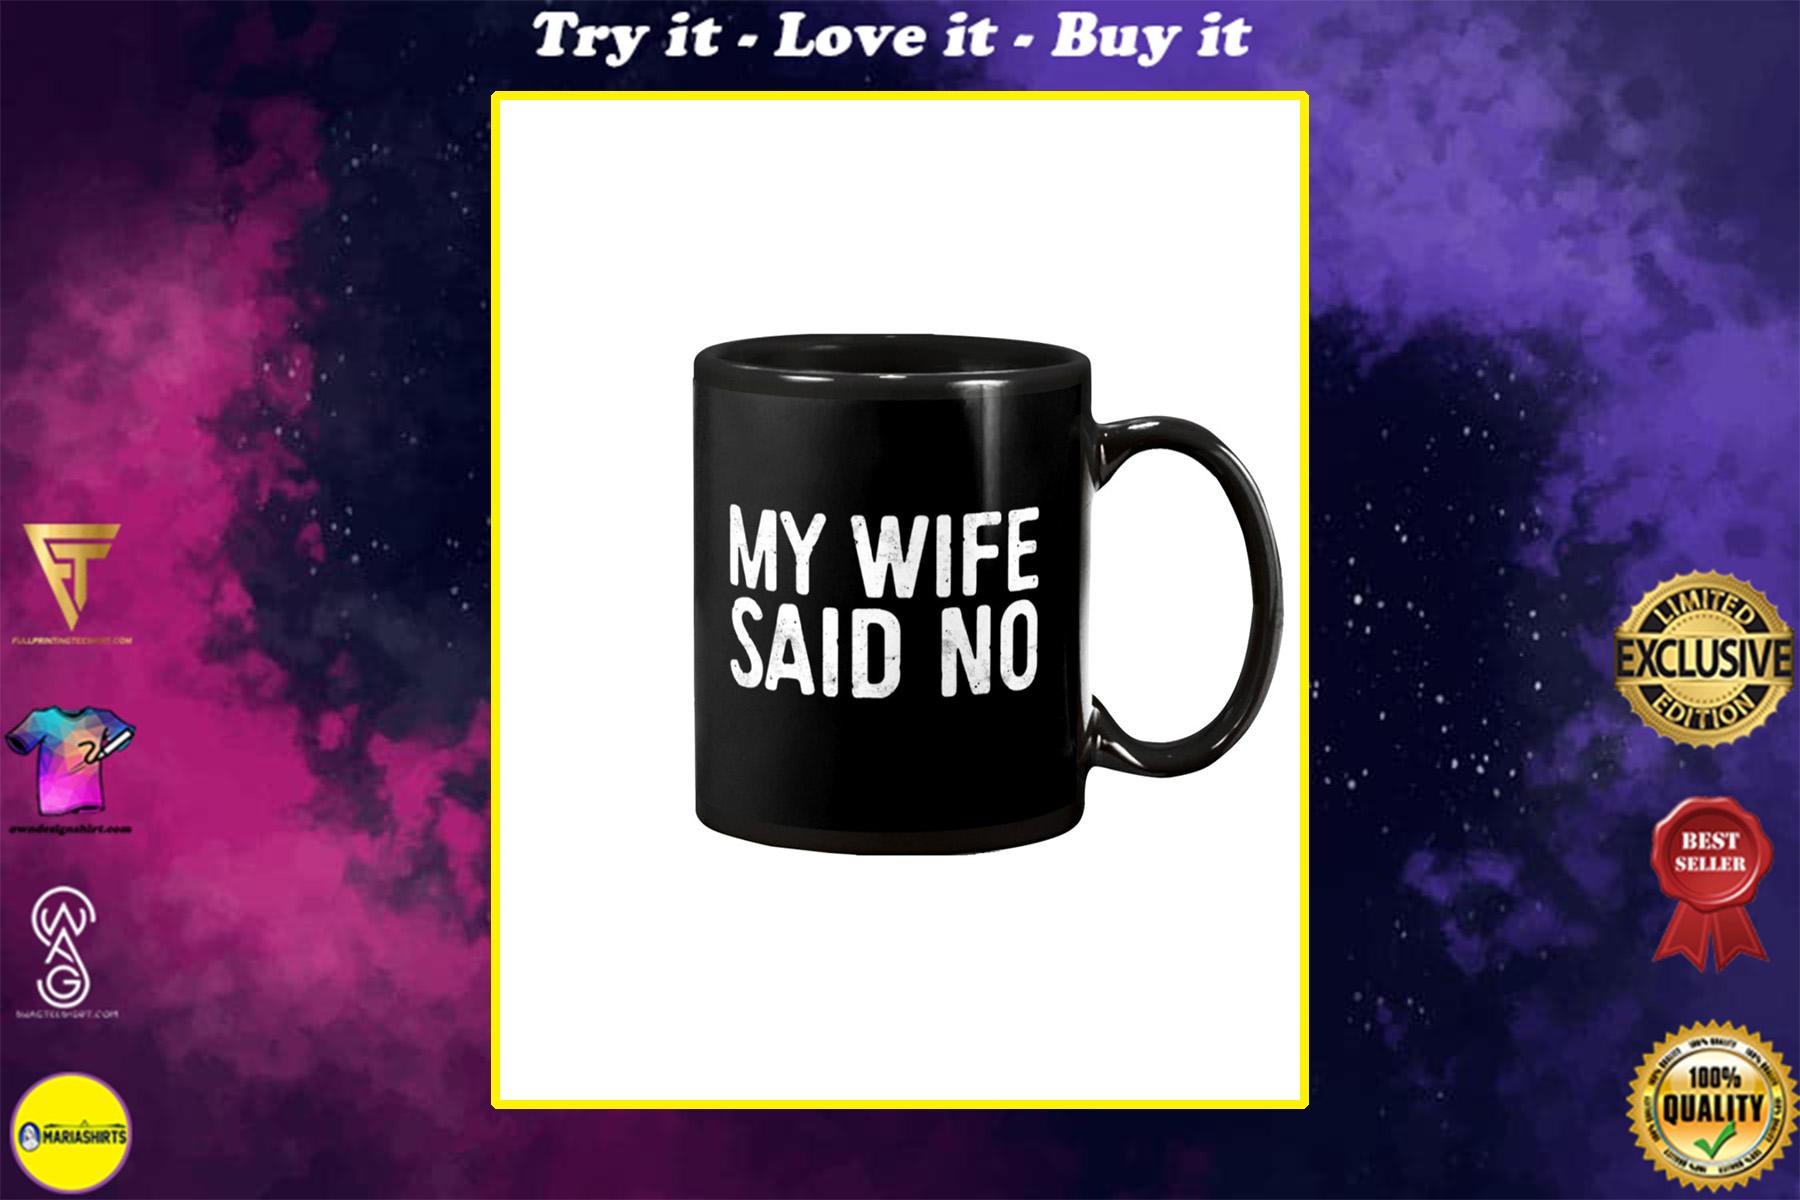 my wife said no happy valentine's day mug